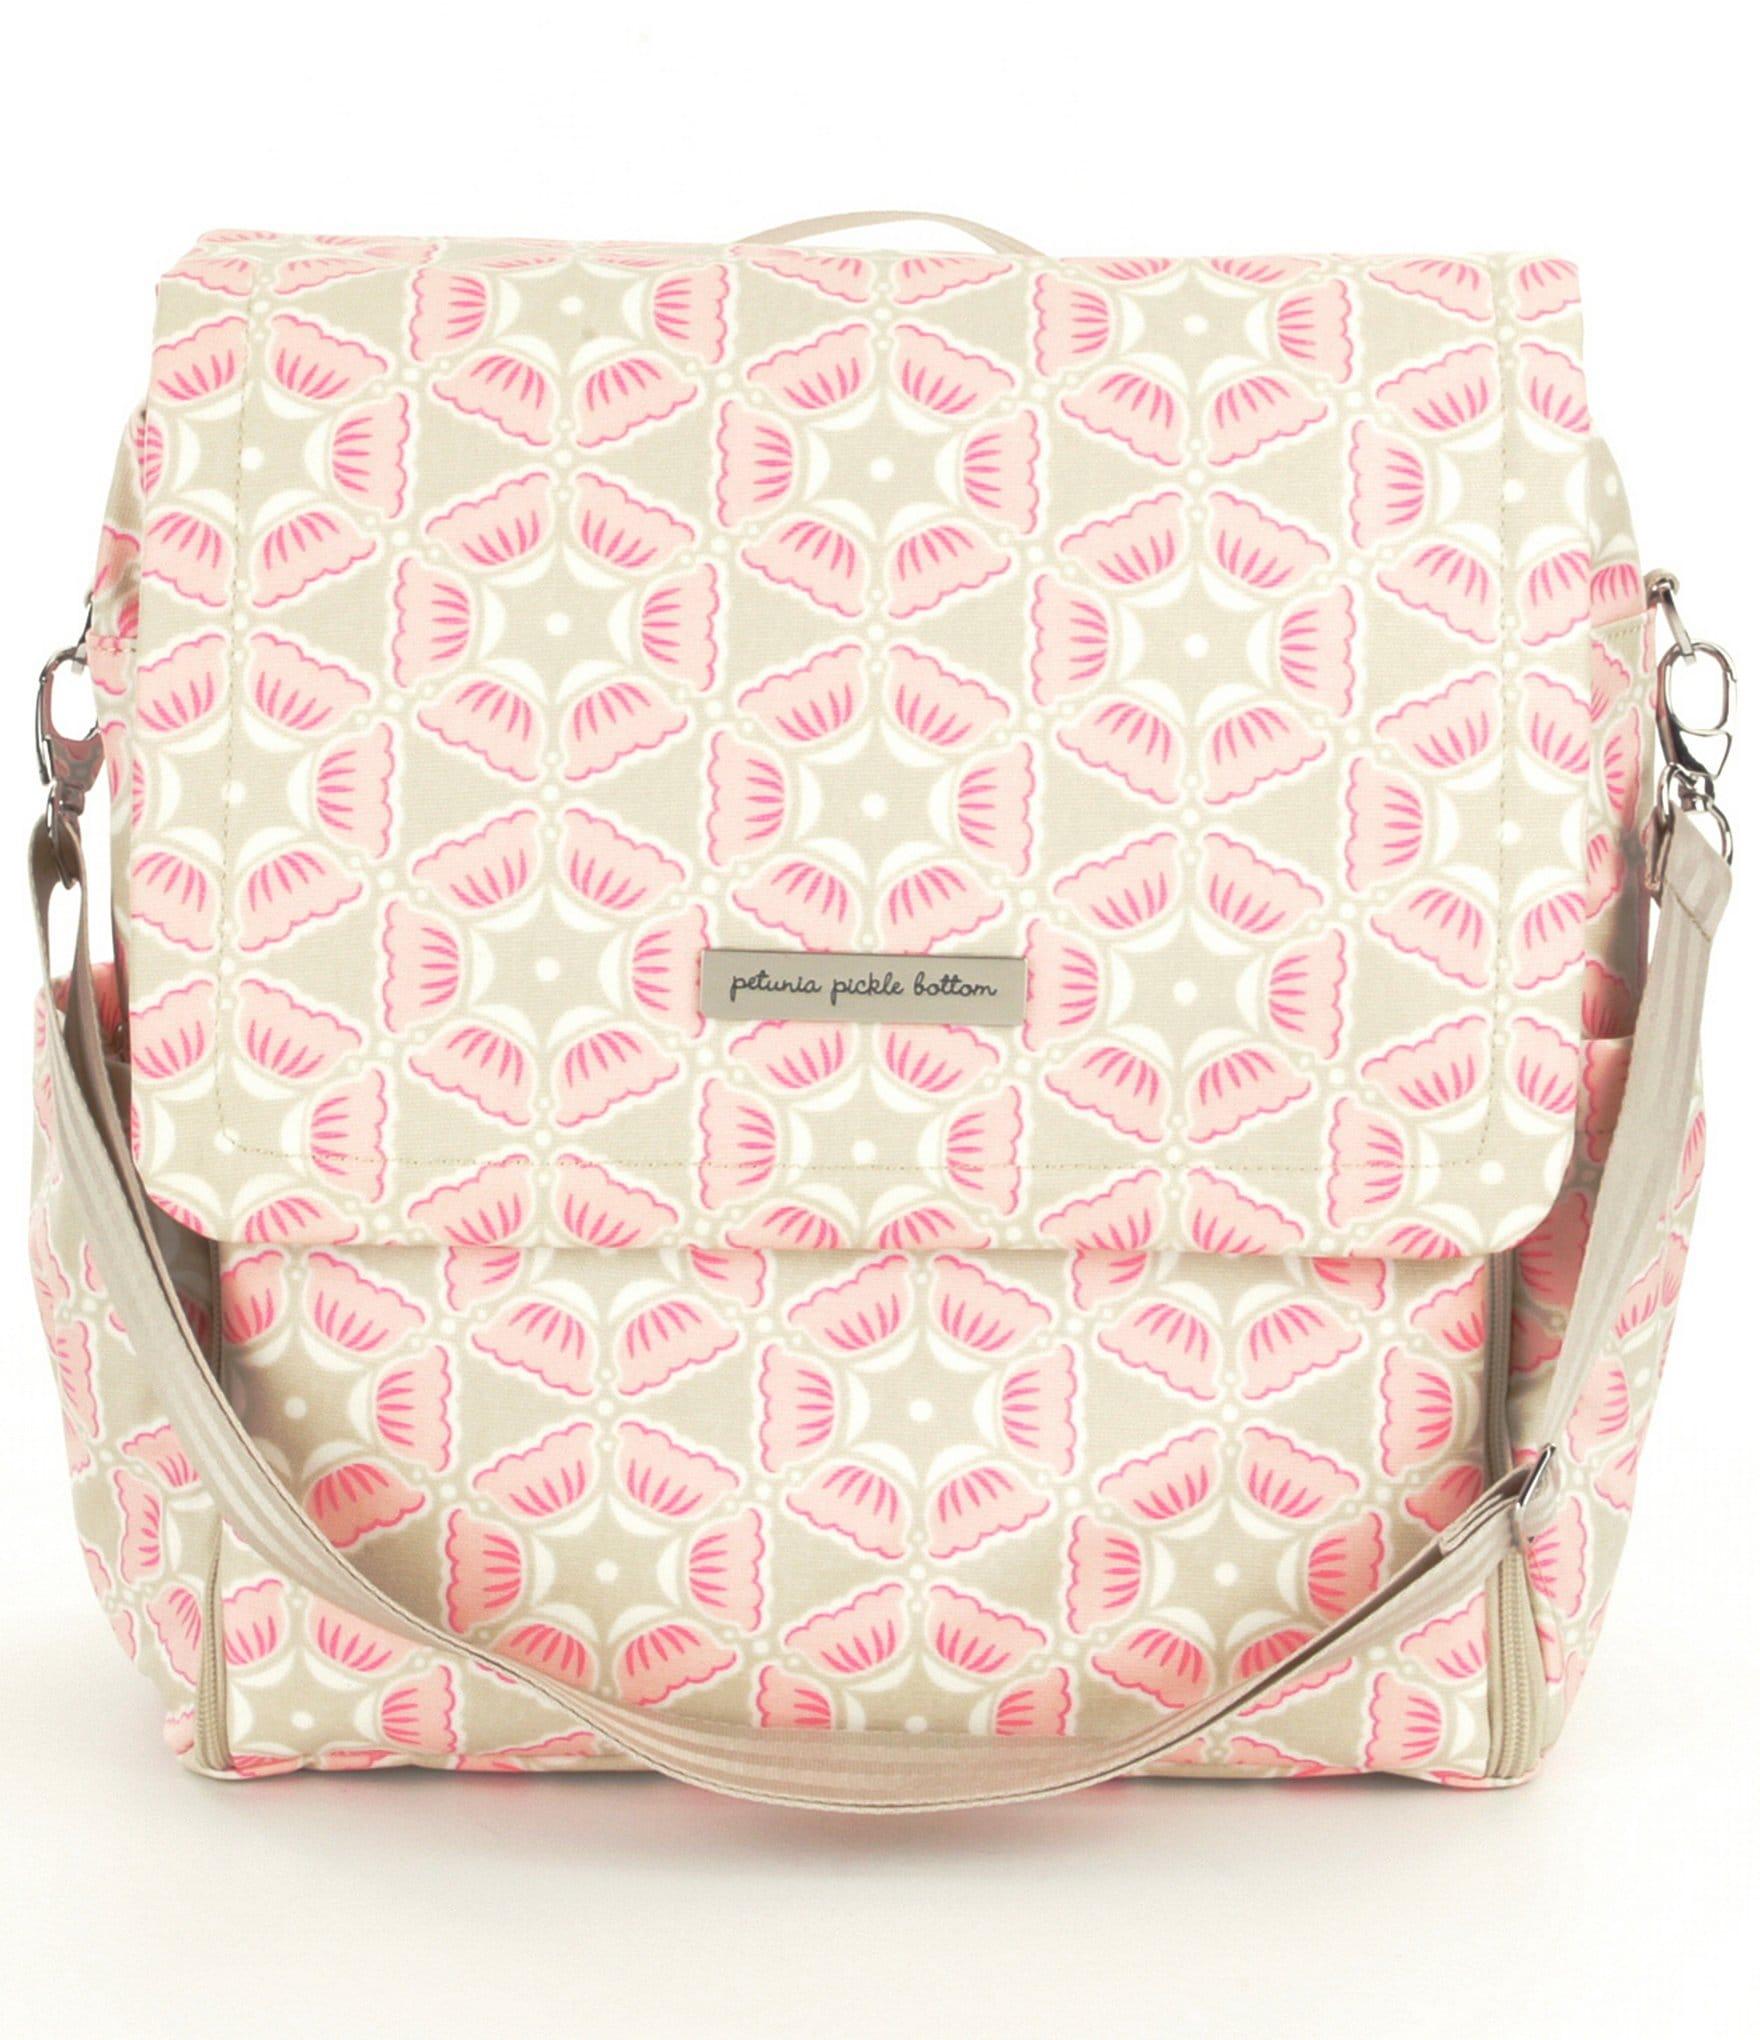 petunia pickle bottom blooming brixham boxy backpack diaper bag dillards. Black Bedroom Furniture Sets. Home Design Ideas